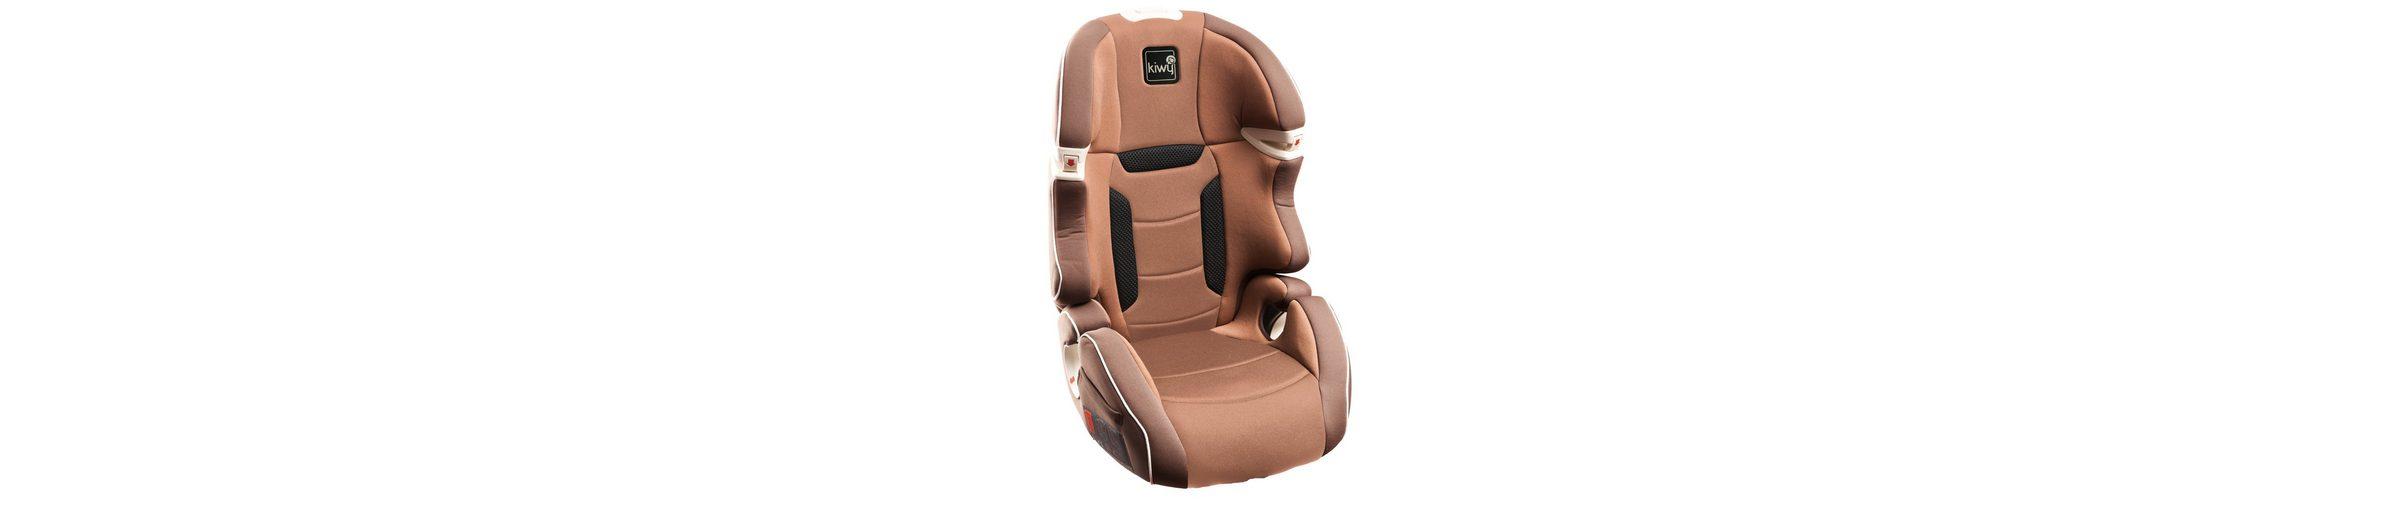 Kindersitz »Kiwy S23«